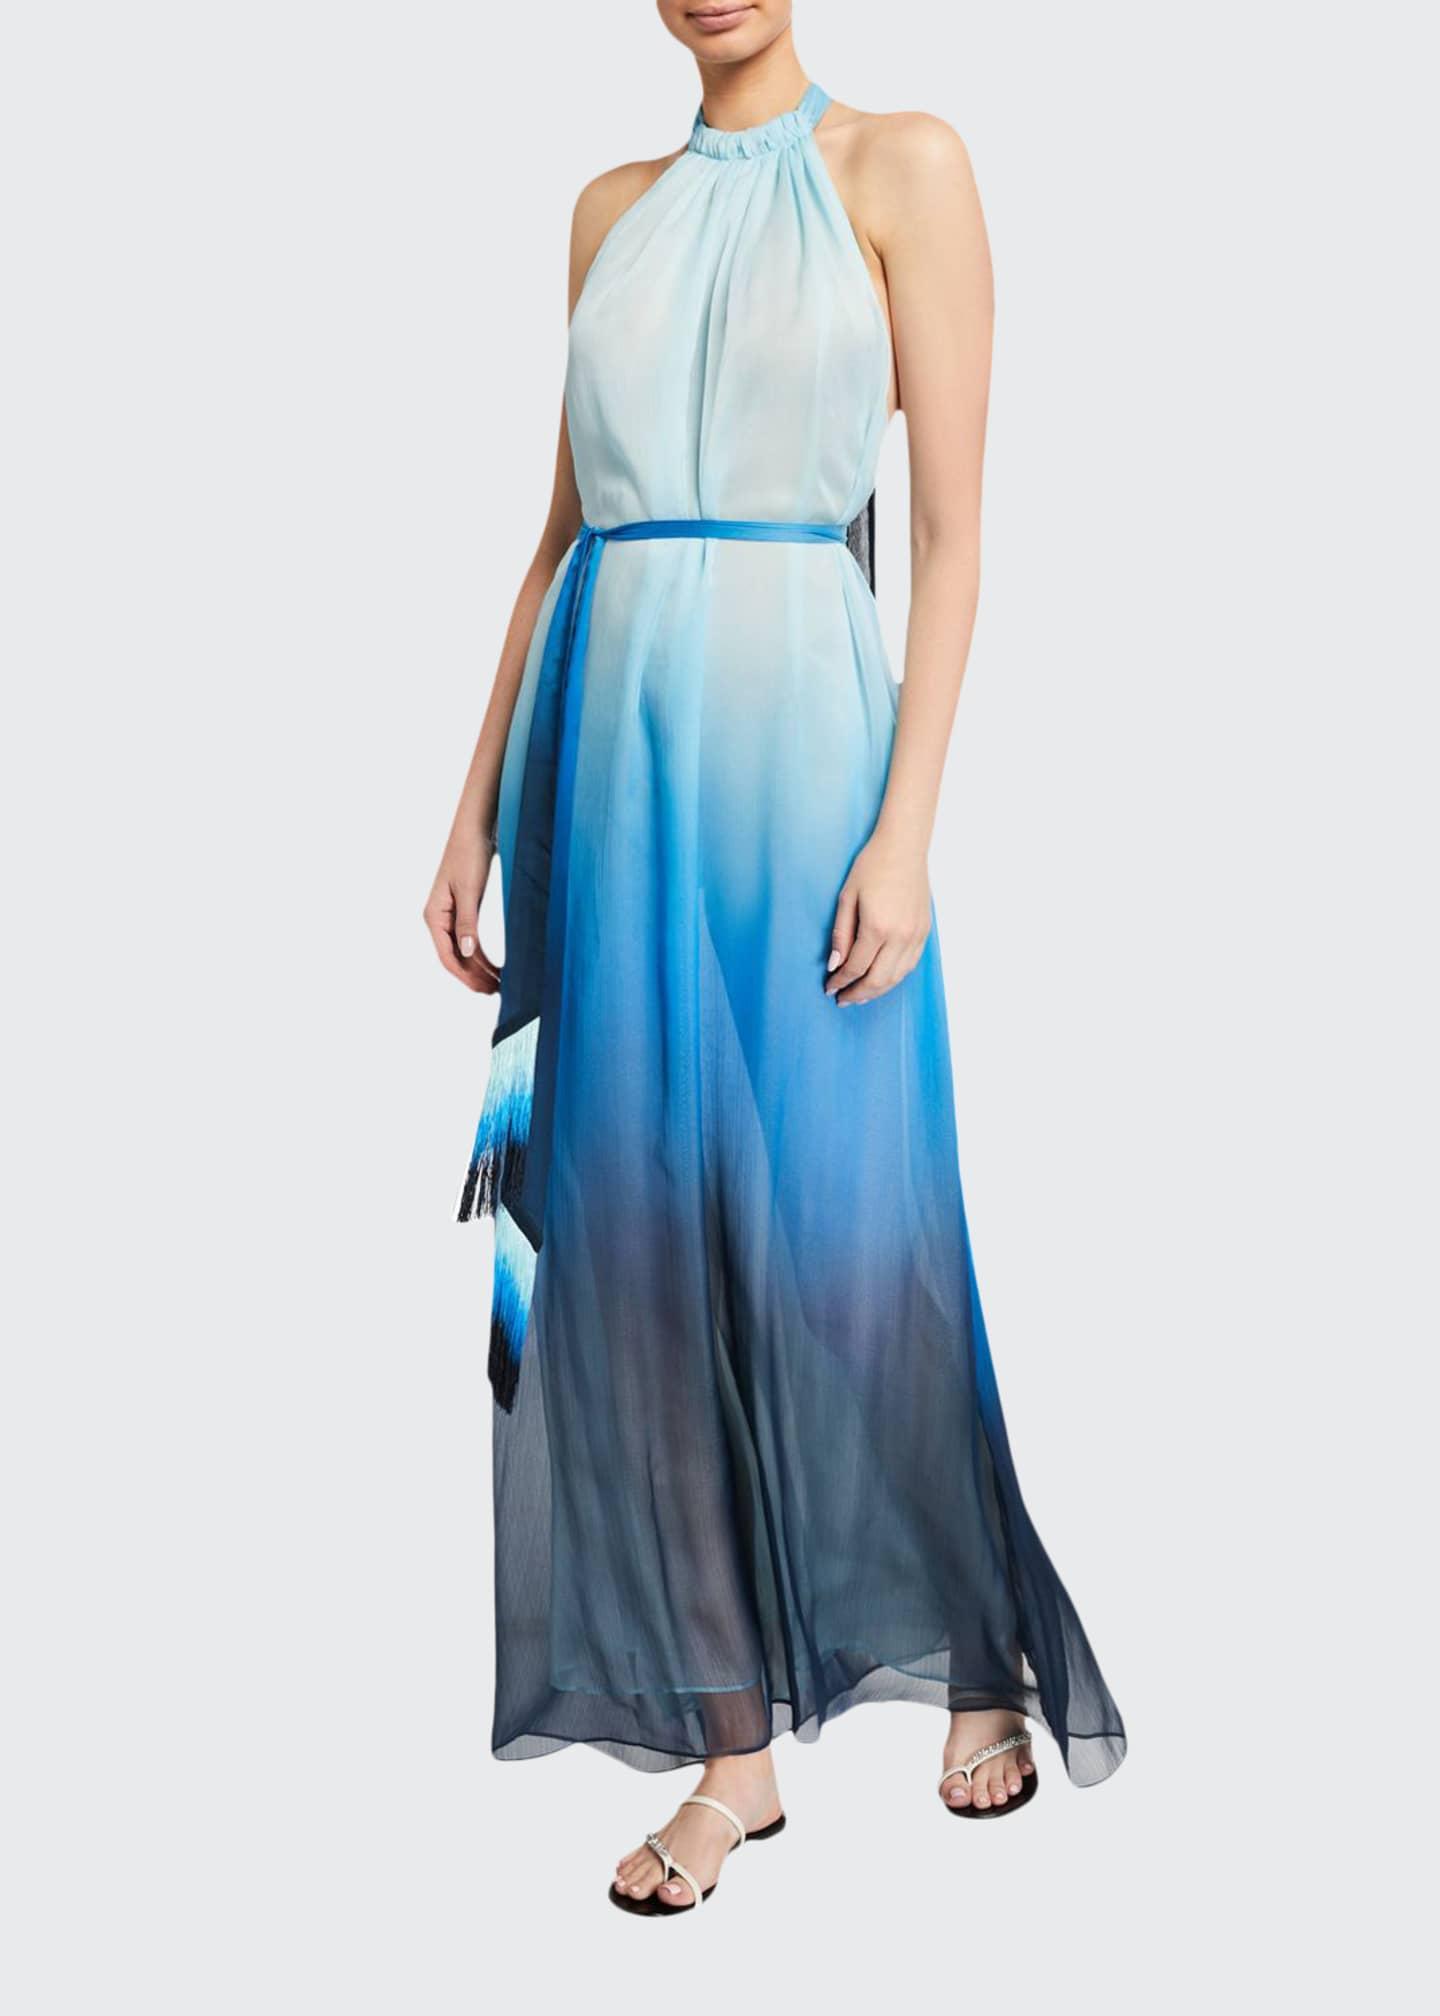 Jonathan Simkhai Ombre Halter Maxi Dress w/ Fringe